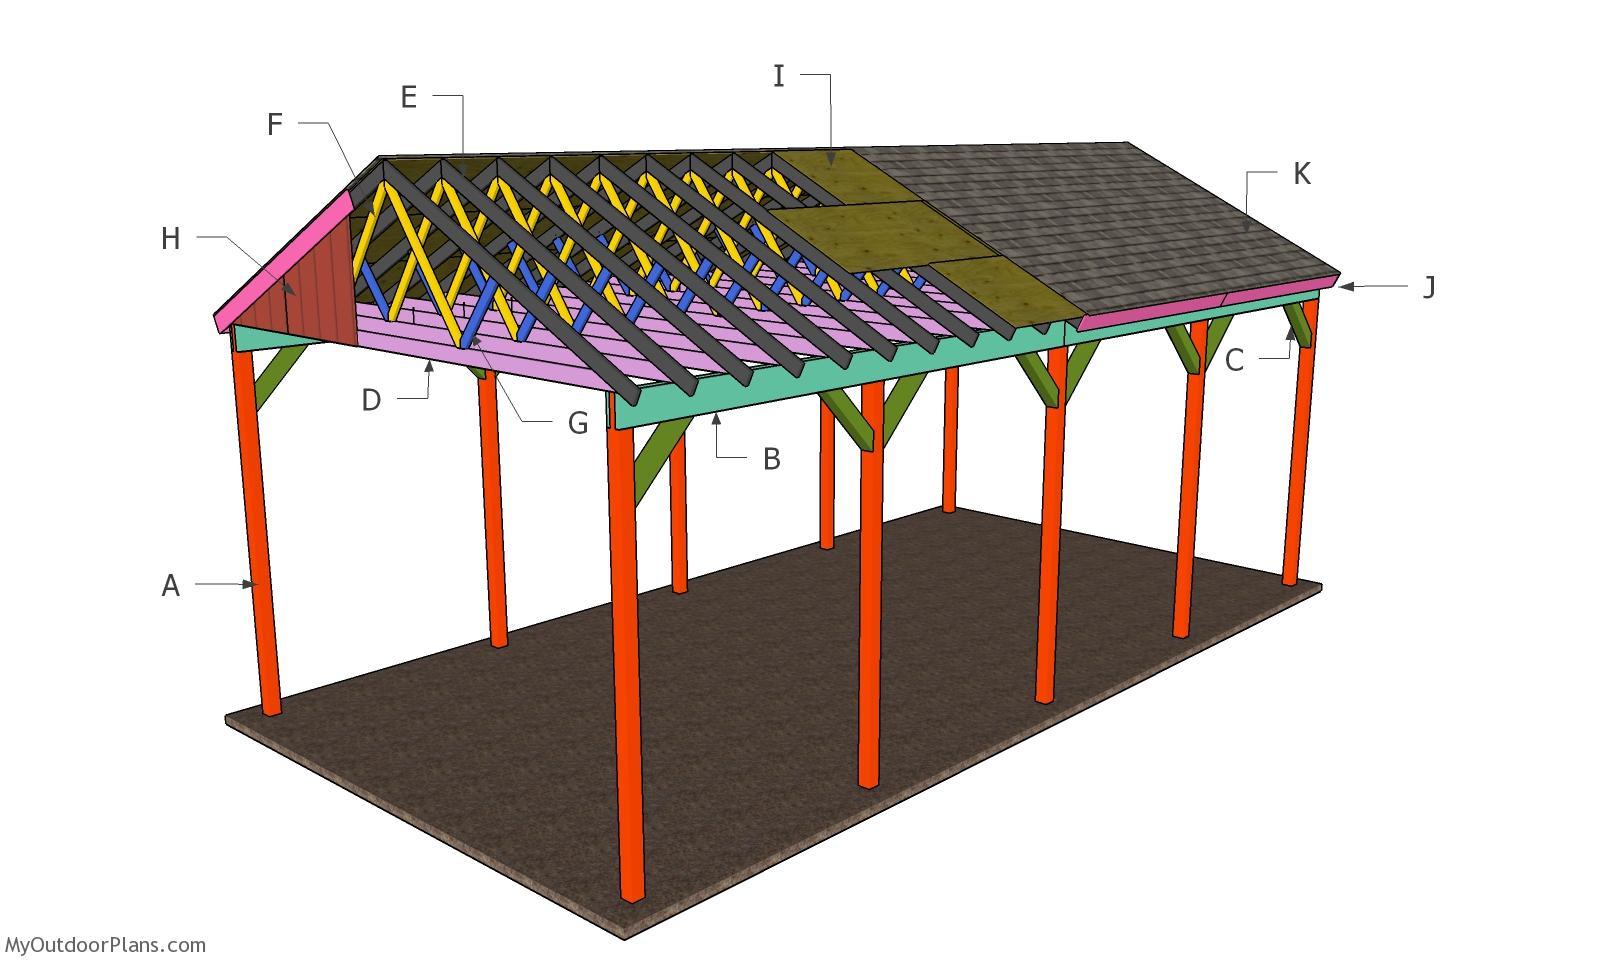 20x40 RV Carport - Gable Roof Plans